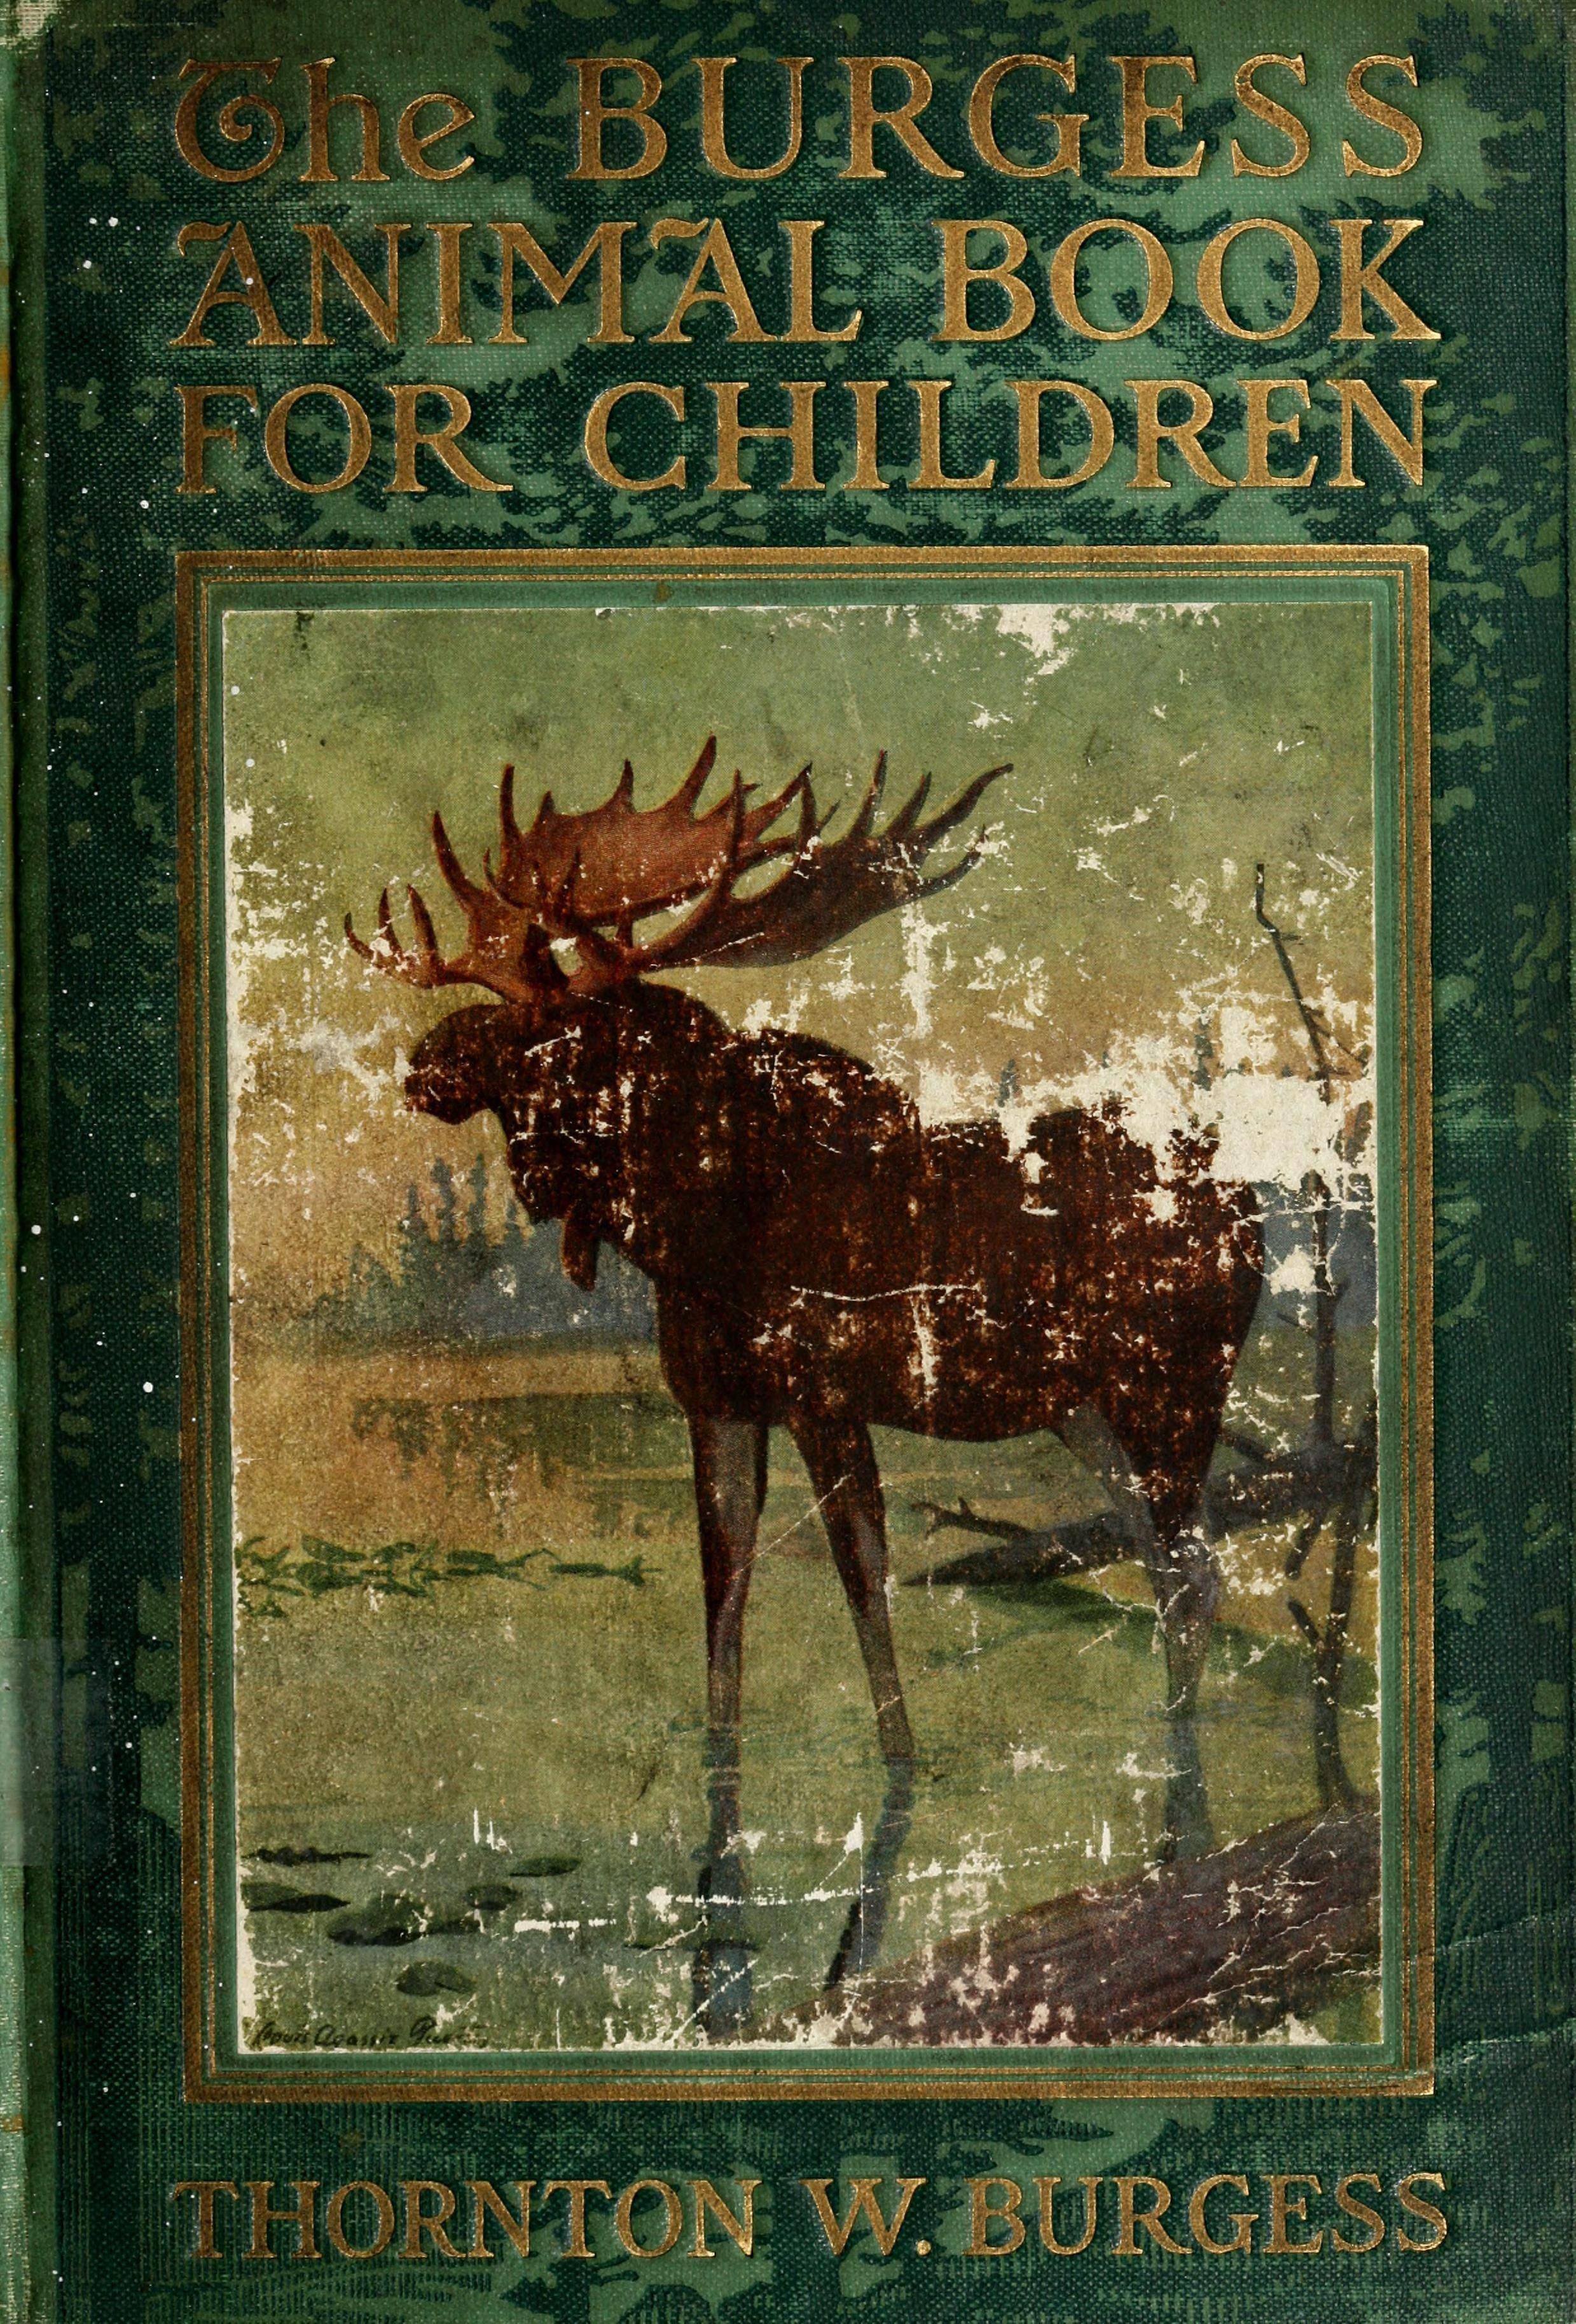 The Burgess Animal Book For Children Thornton W